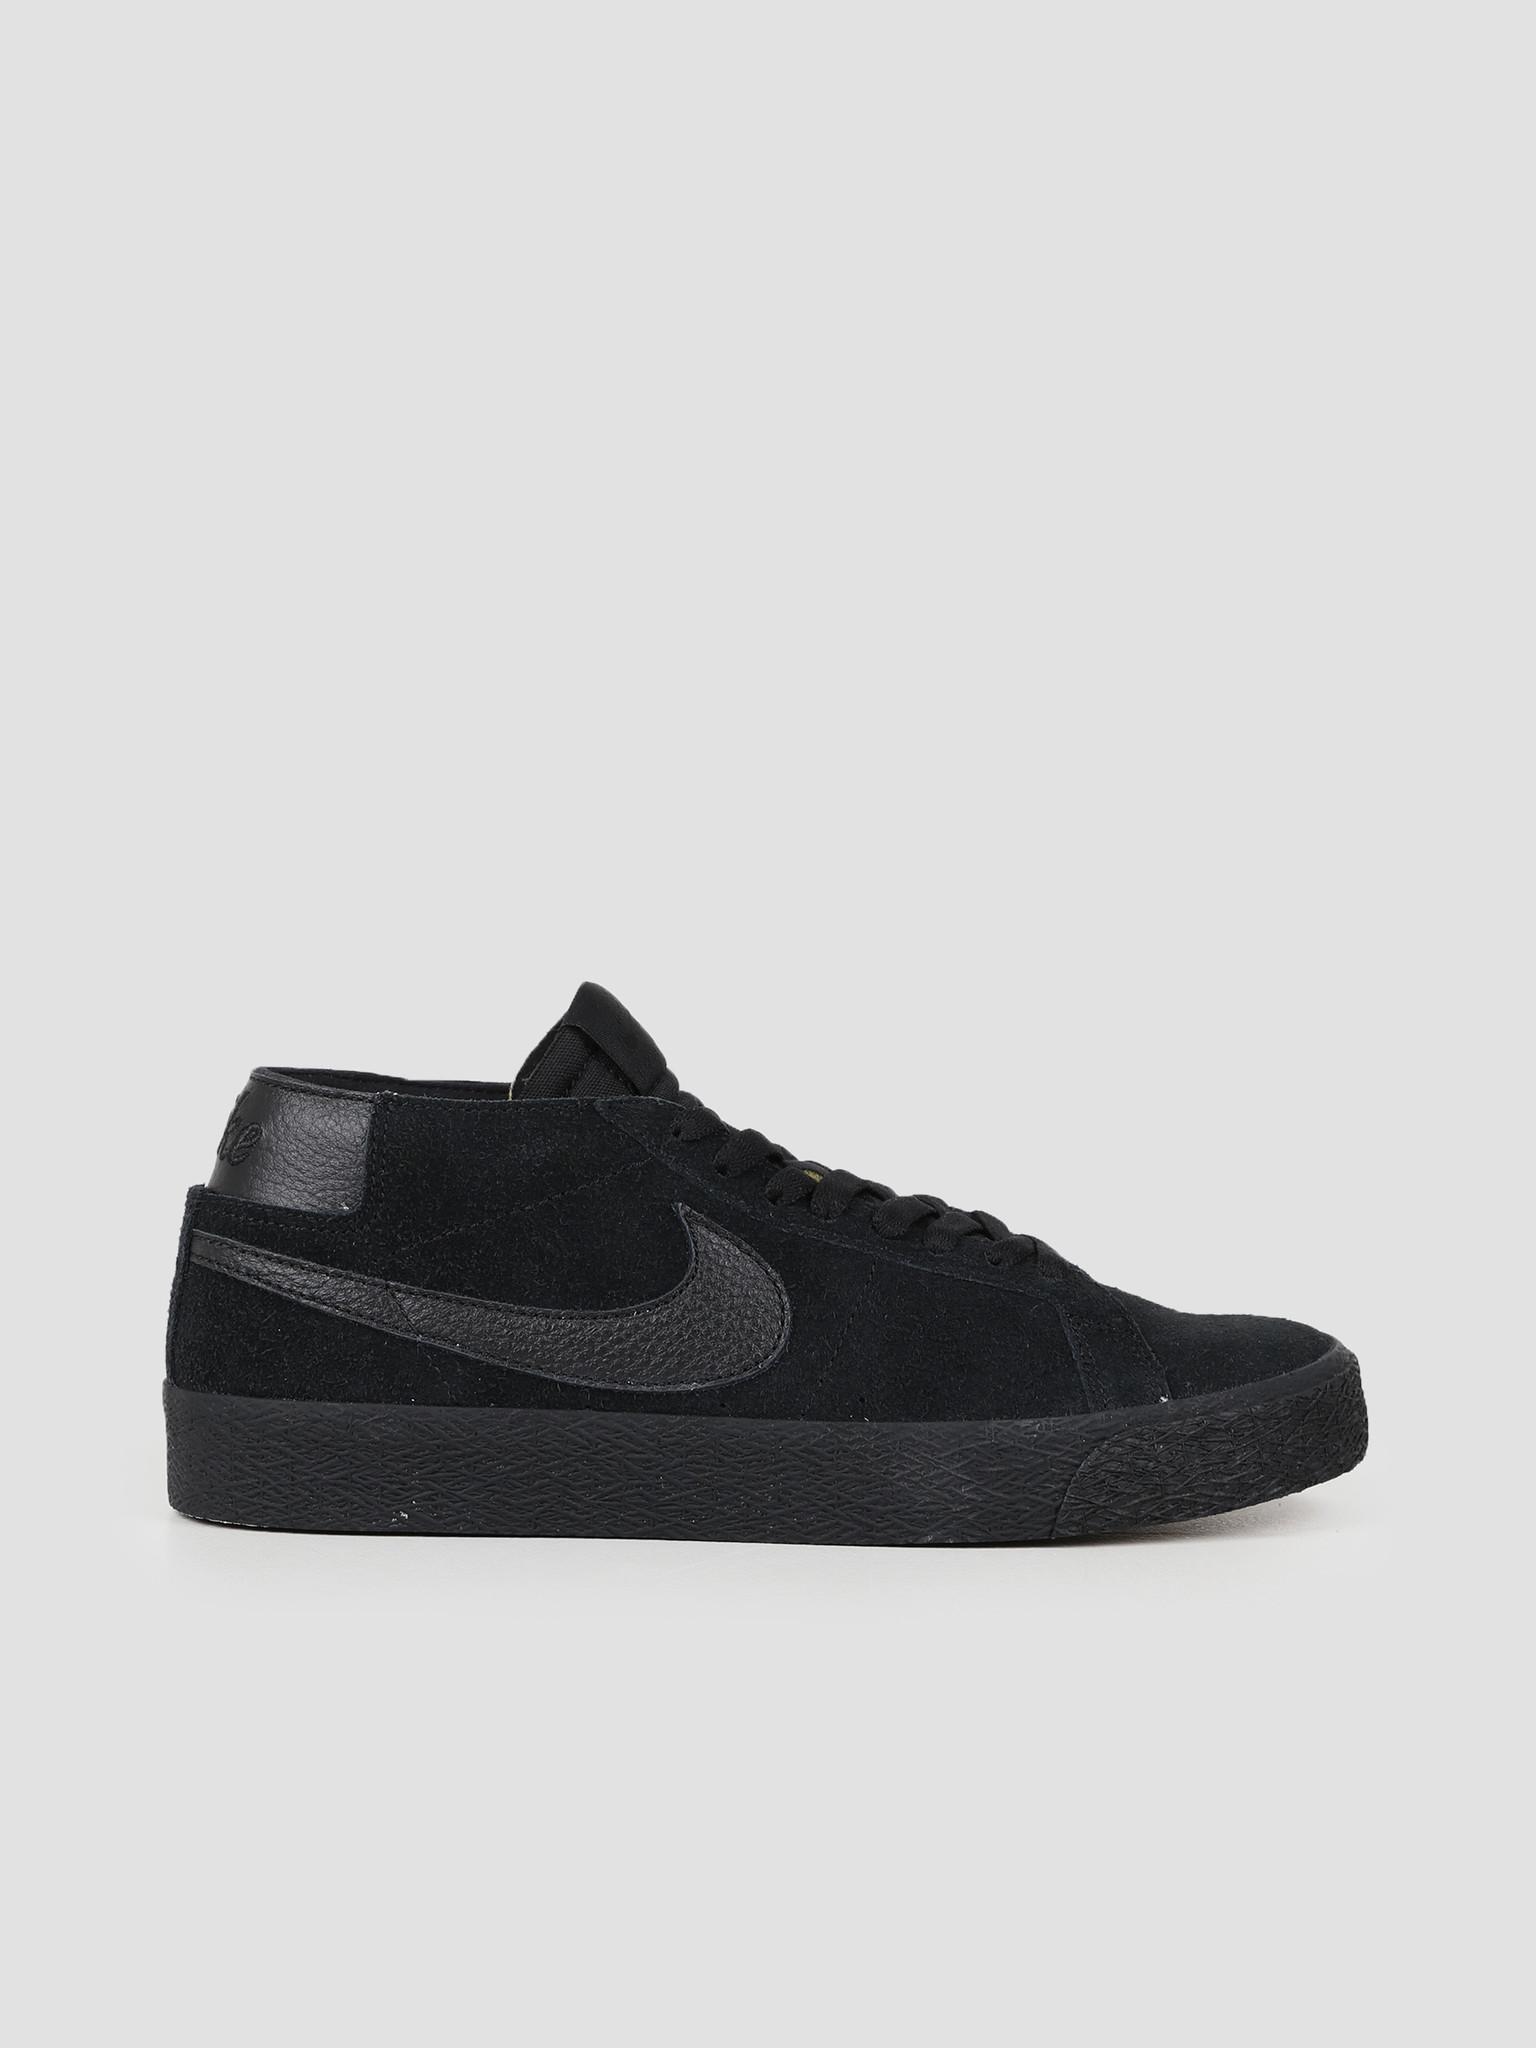 hot sale online 4e27d fdf3c Nike SB Zoom Blazer Chukka Black Black AT9765-004